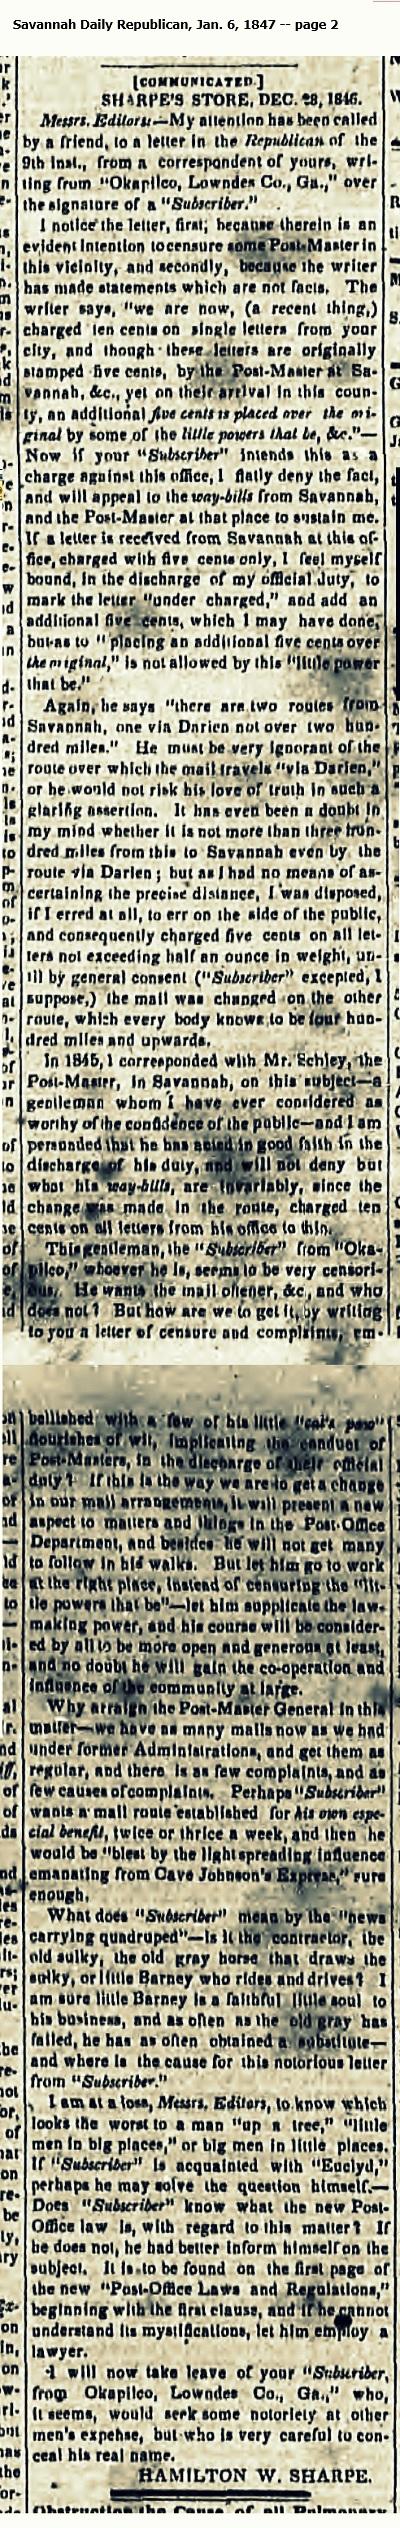 Sharpe's Store, December 28, 1846